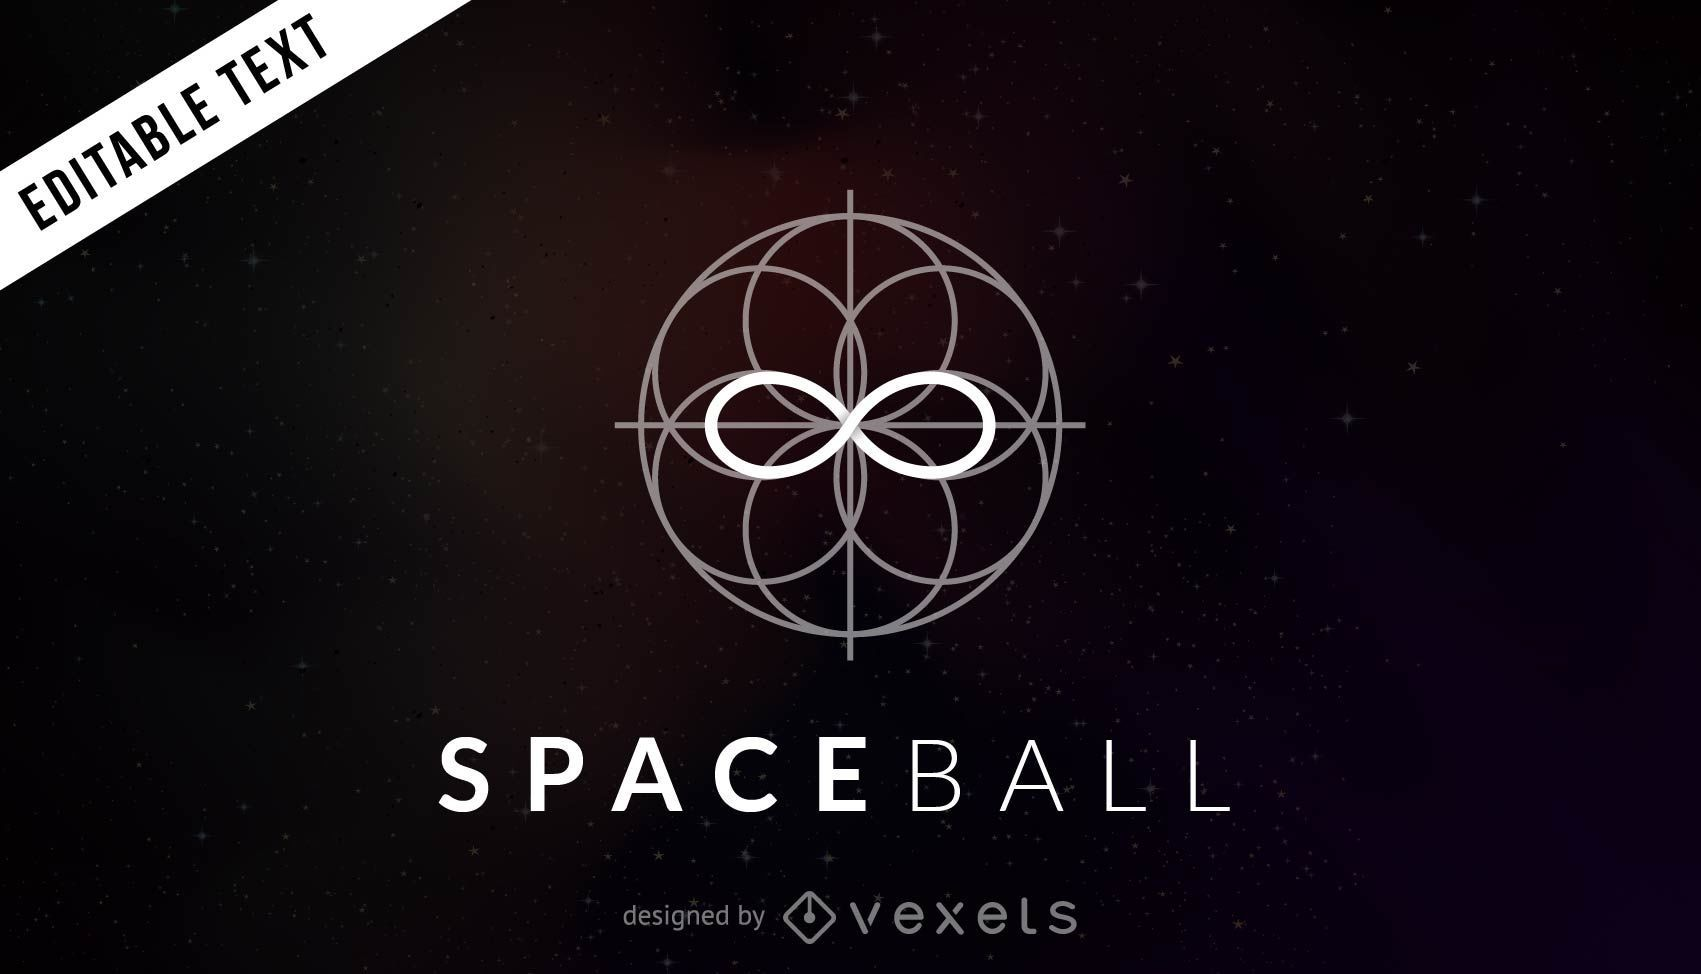 Space ball logo template